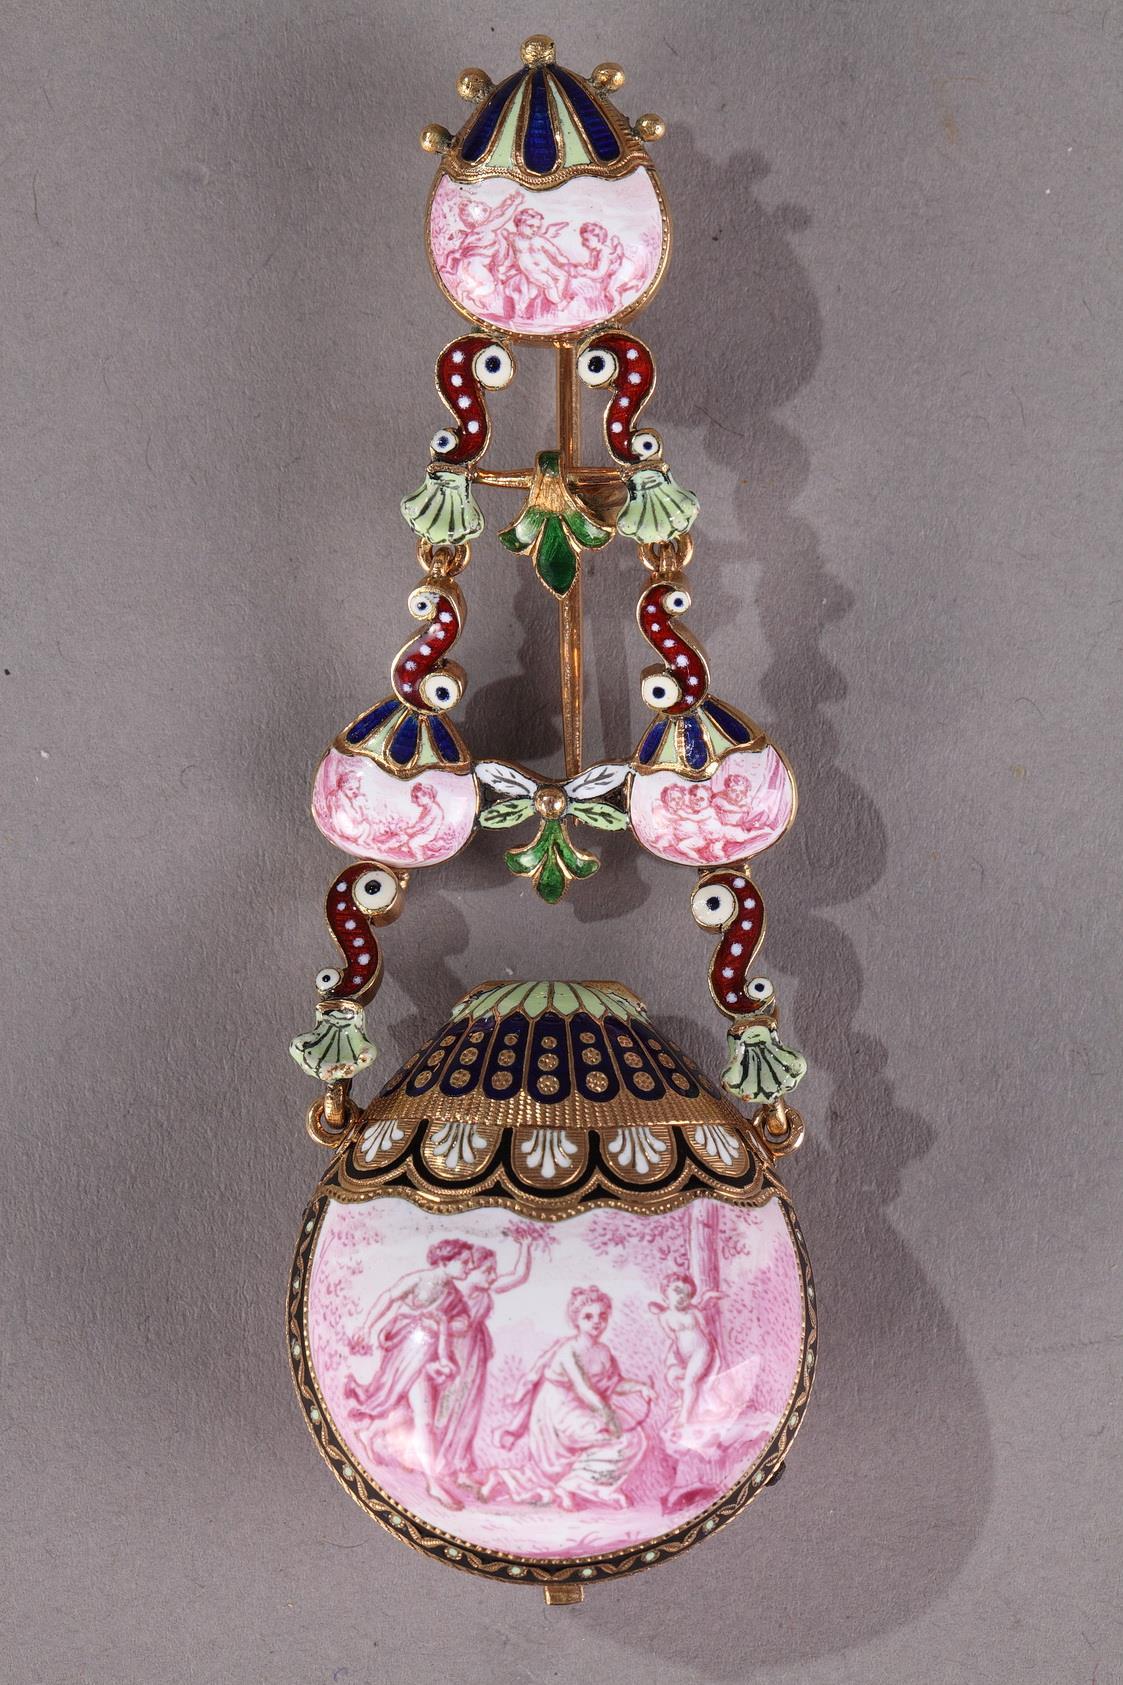 Gold and Enamel watch. <br/>Viennese Craftsmanship Circa 1860-1870.